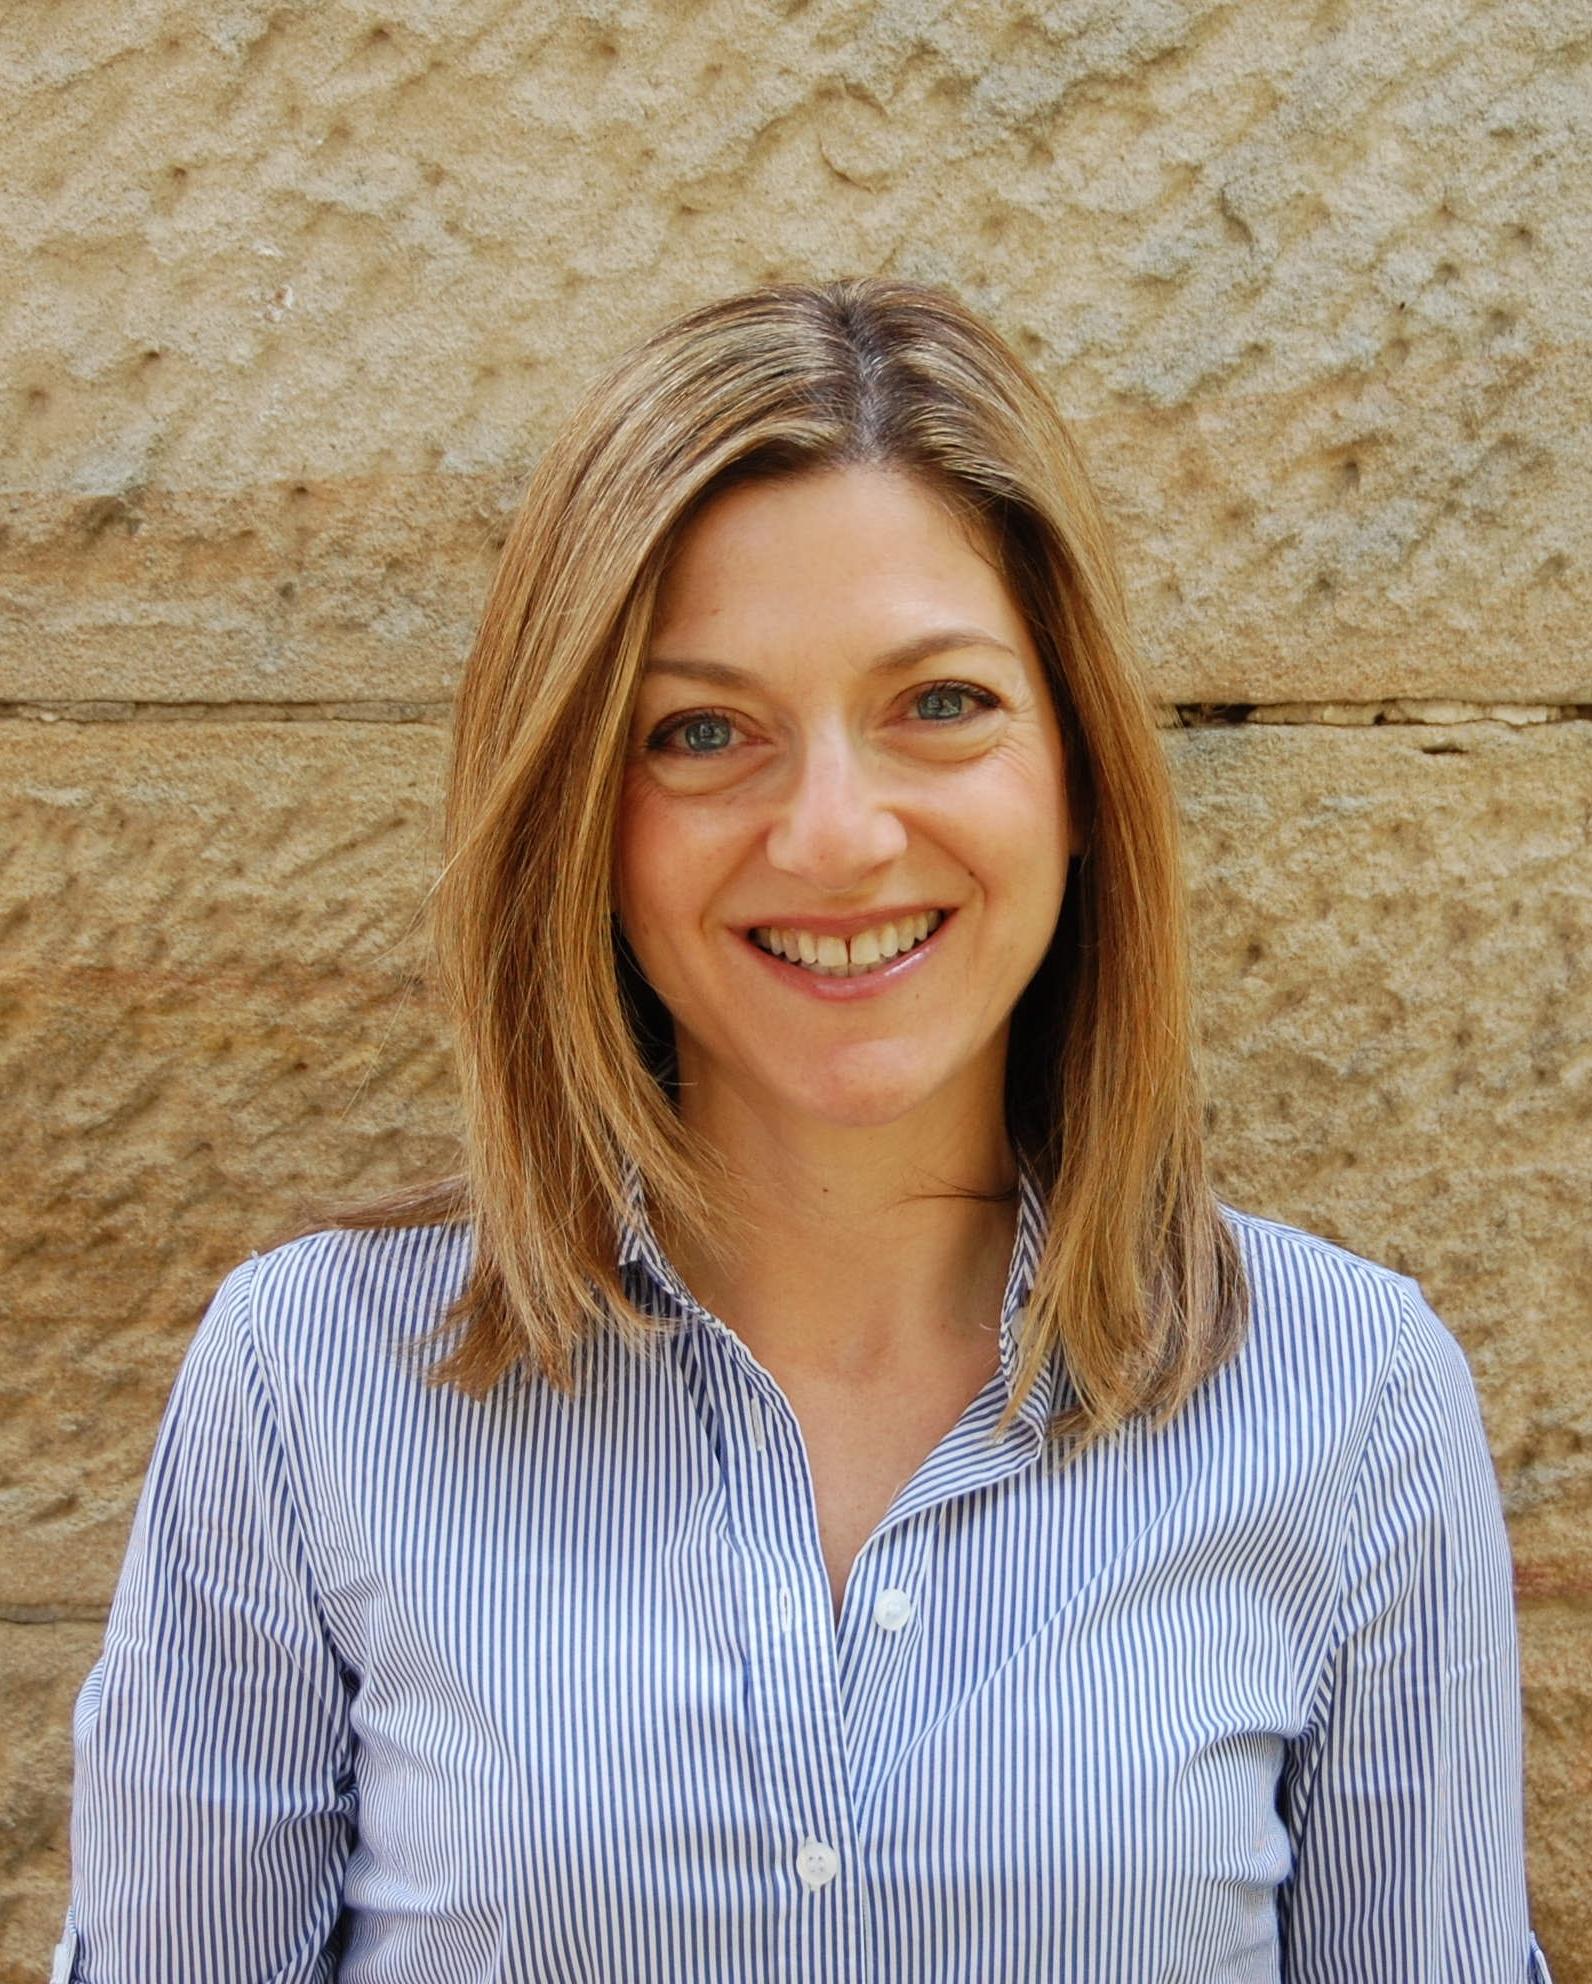 Dr Nicole Anita Kochan